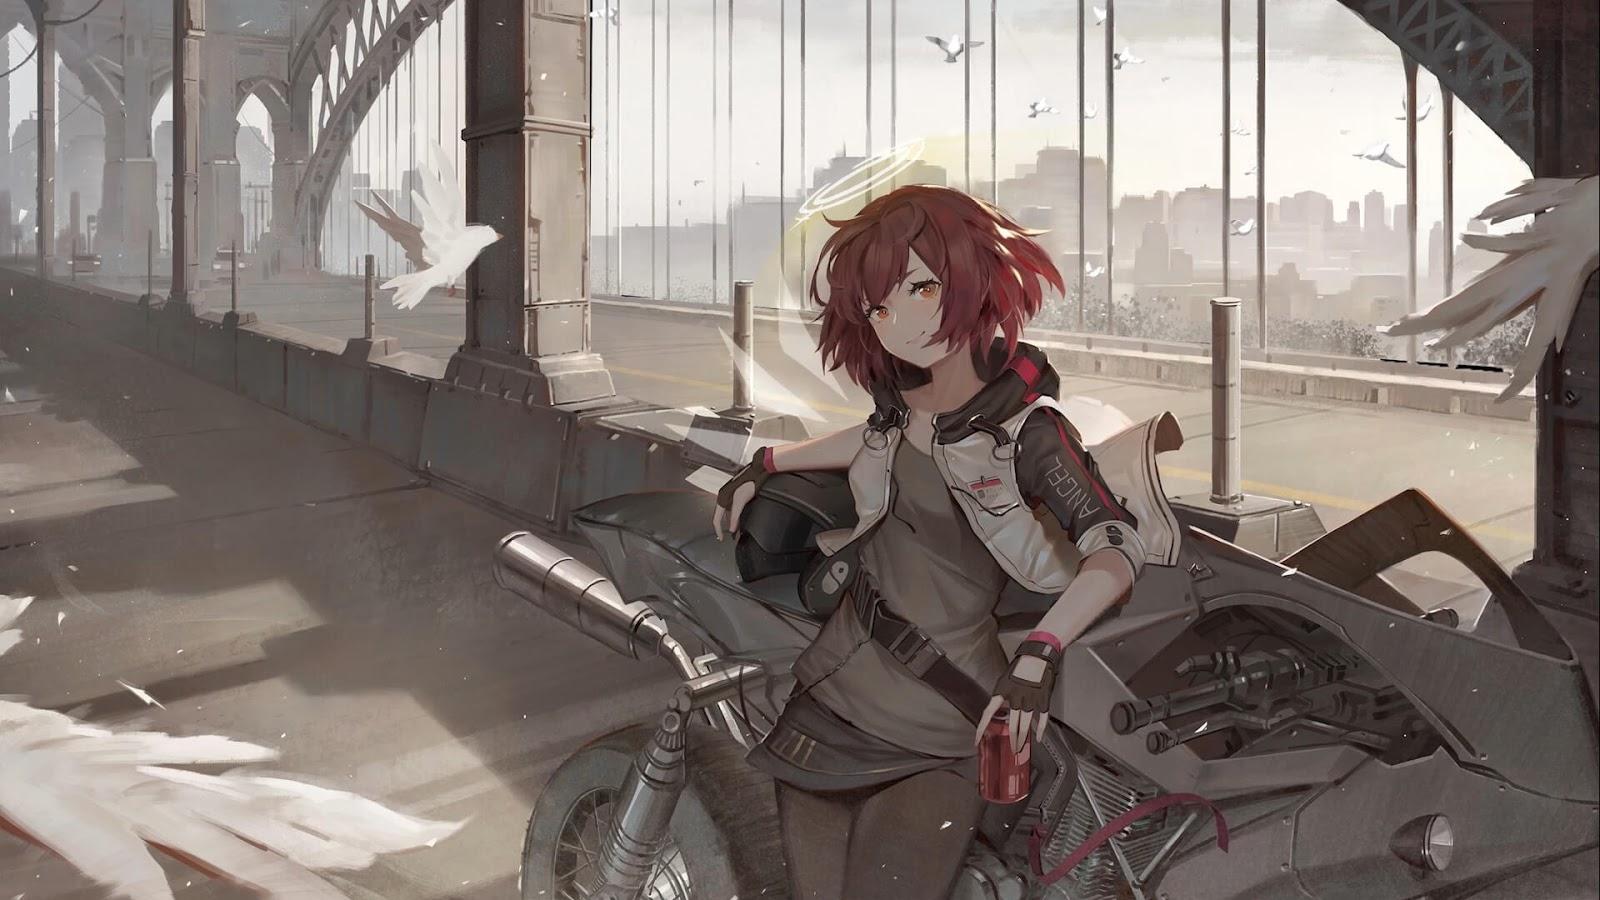 Tomorrow's Ark [1080P] [Wallpaper Engine Anime]